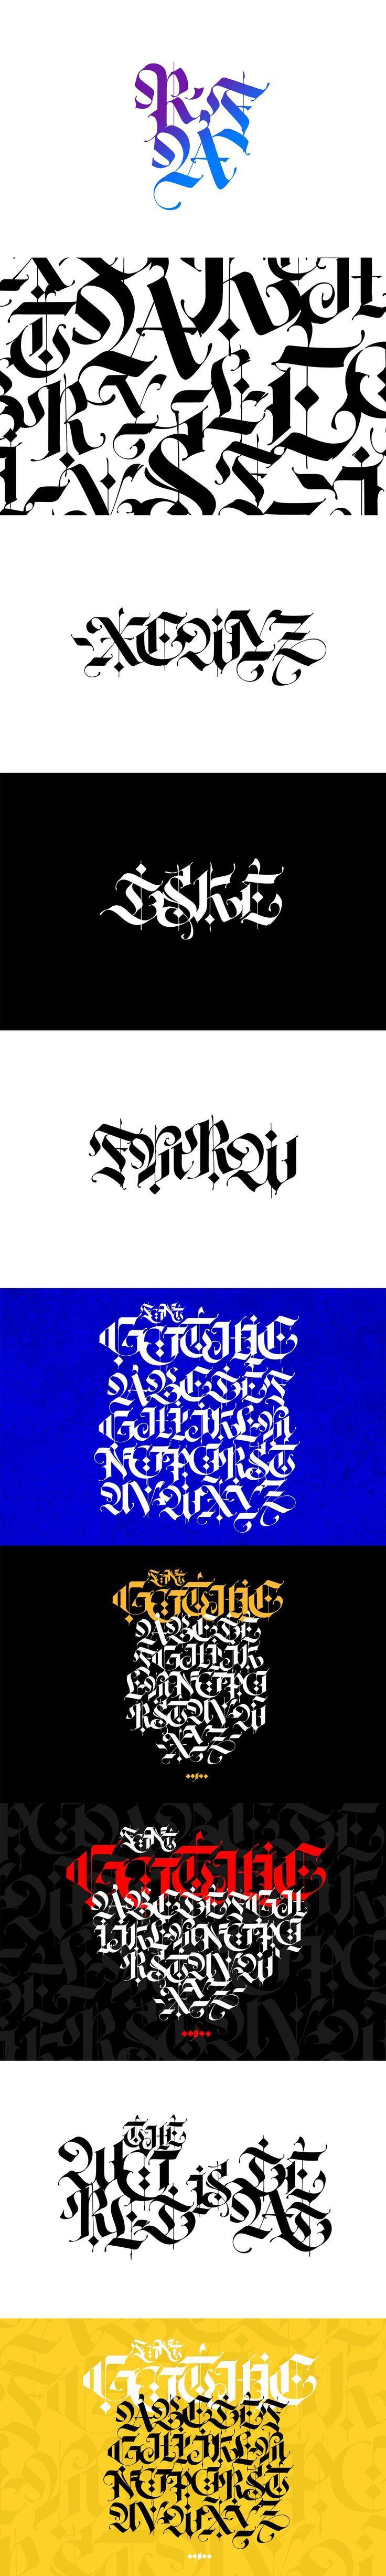 Gothic modern Web graphic design, Gothic fonts, Gothic